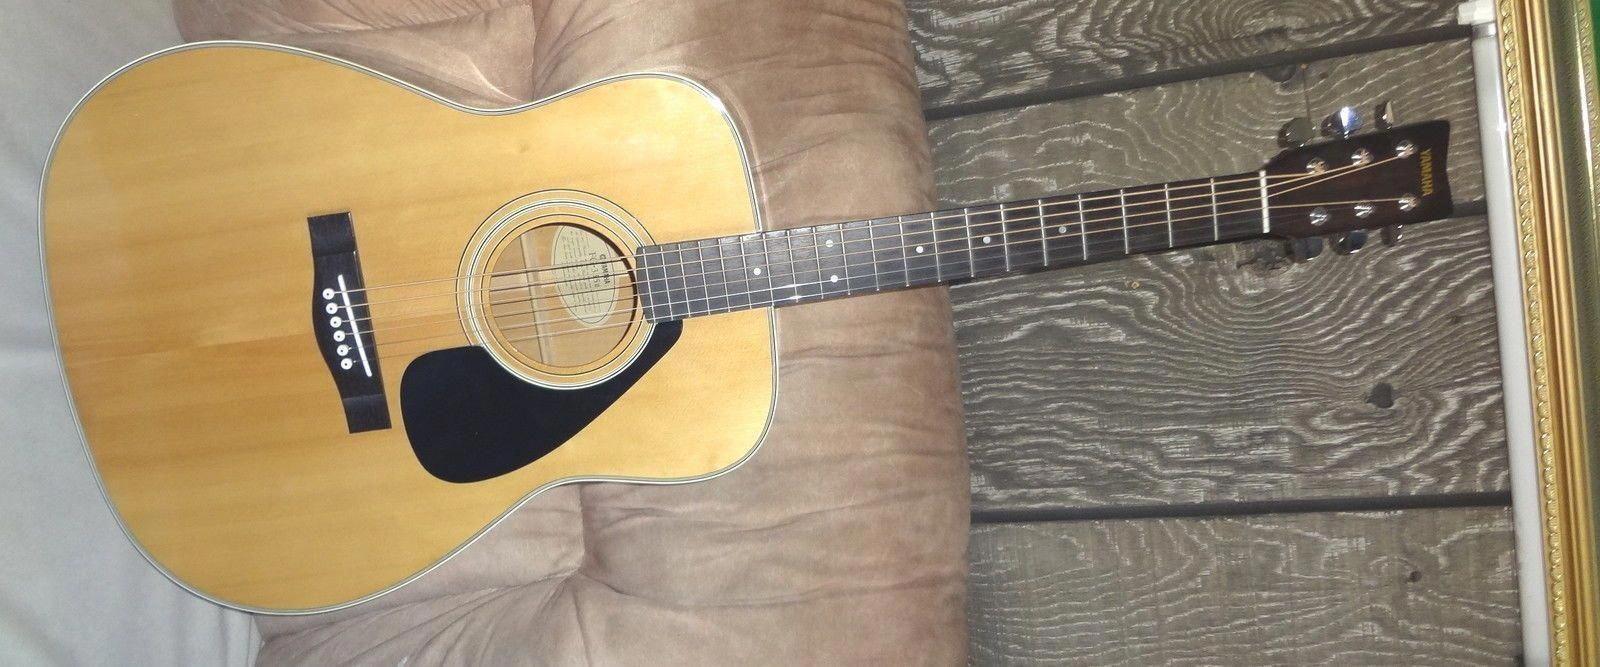 Best Quality Fender Acoustic Guitars Fenderacousticguitars Acoustic Guitar Accessories Yamaha Guitar Taylor Guitars Acoustic